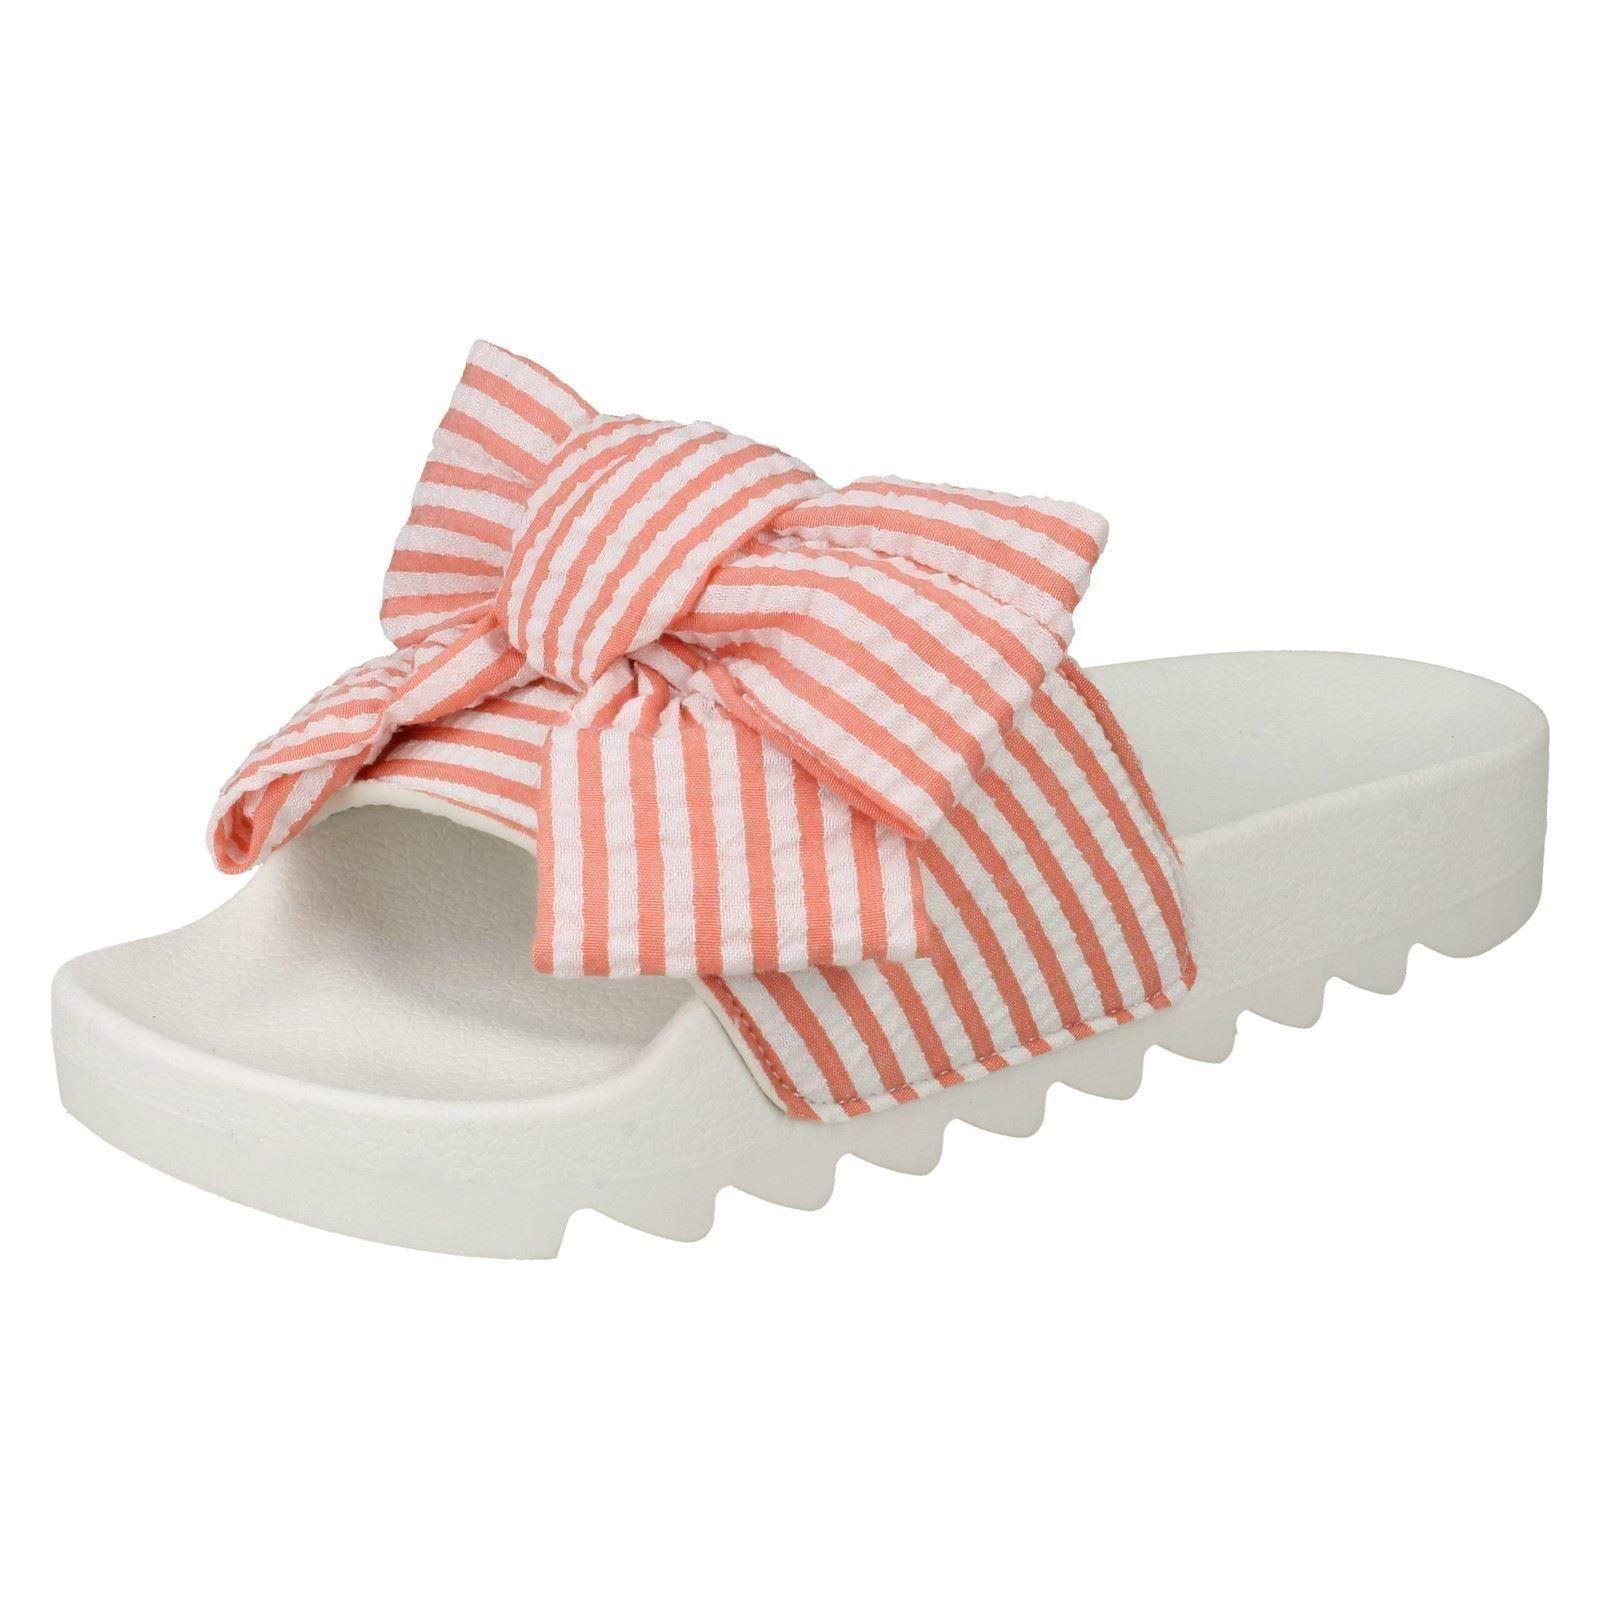 Spot On Ladies Striped Bow Vamp Summer Sliders